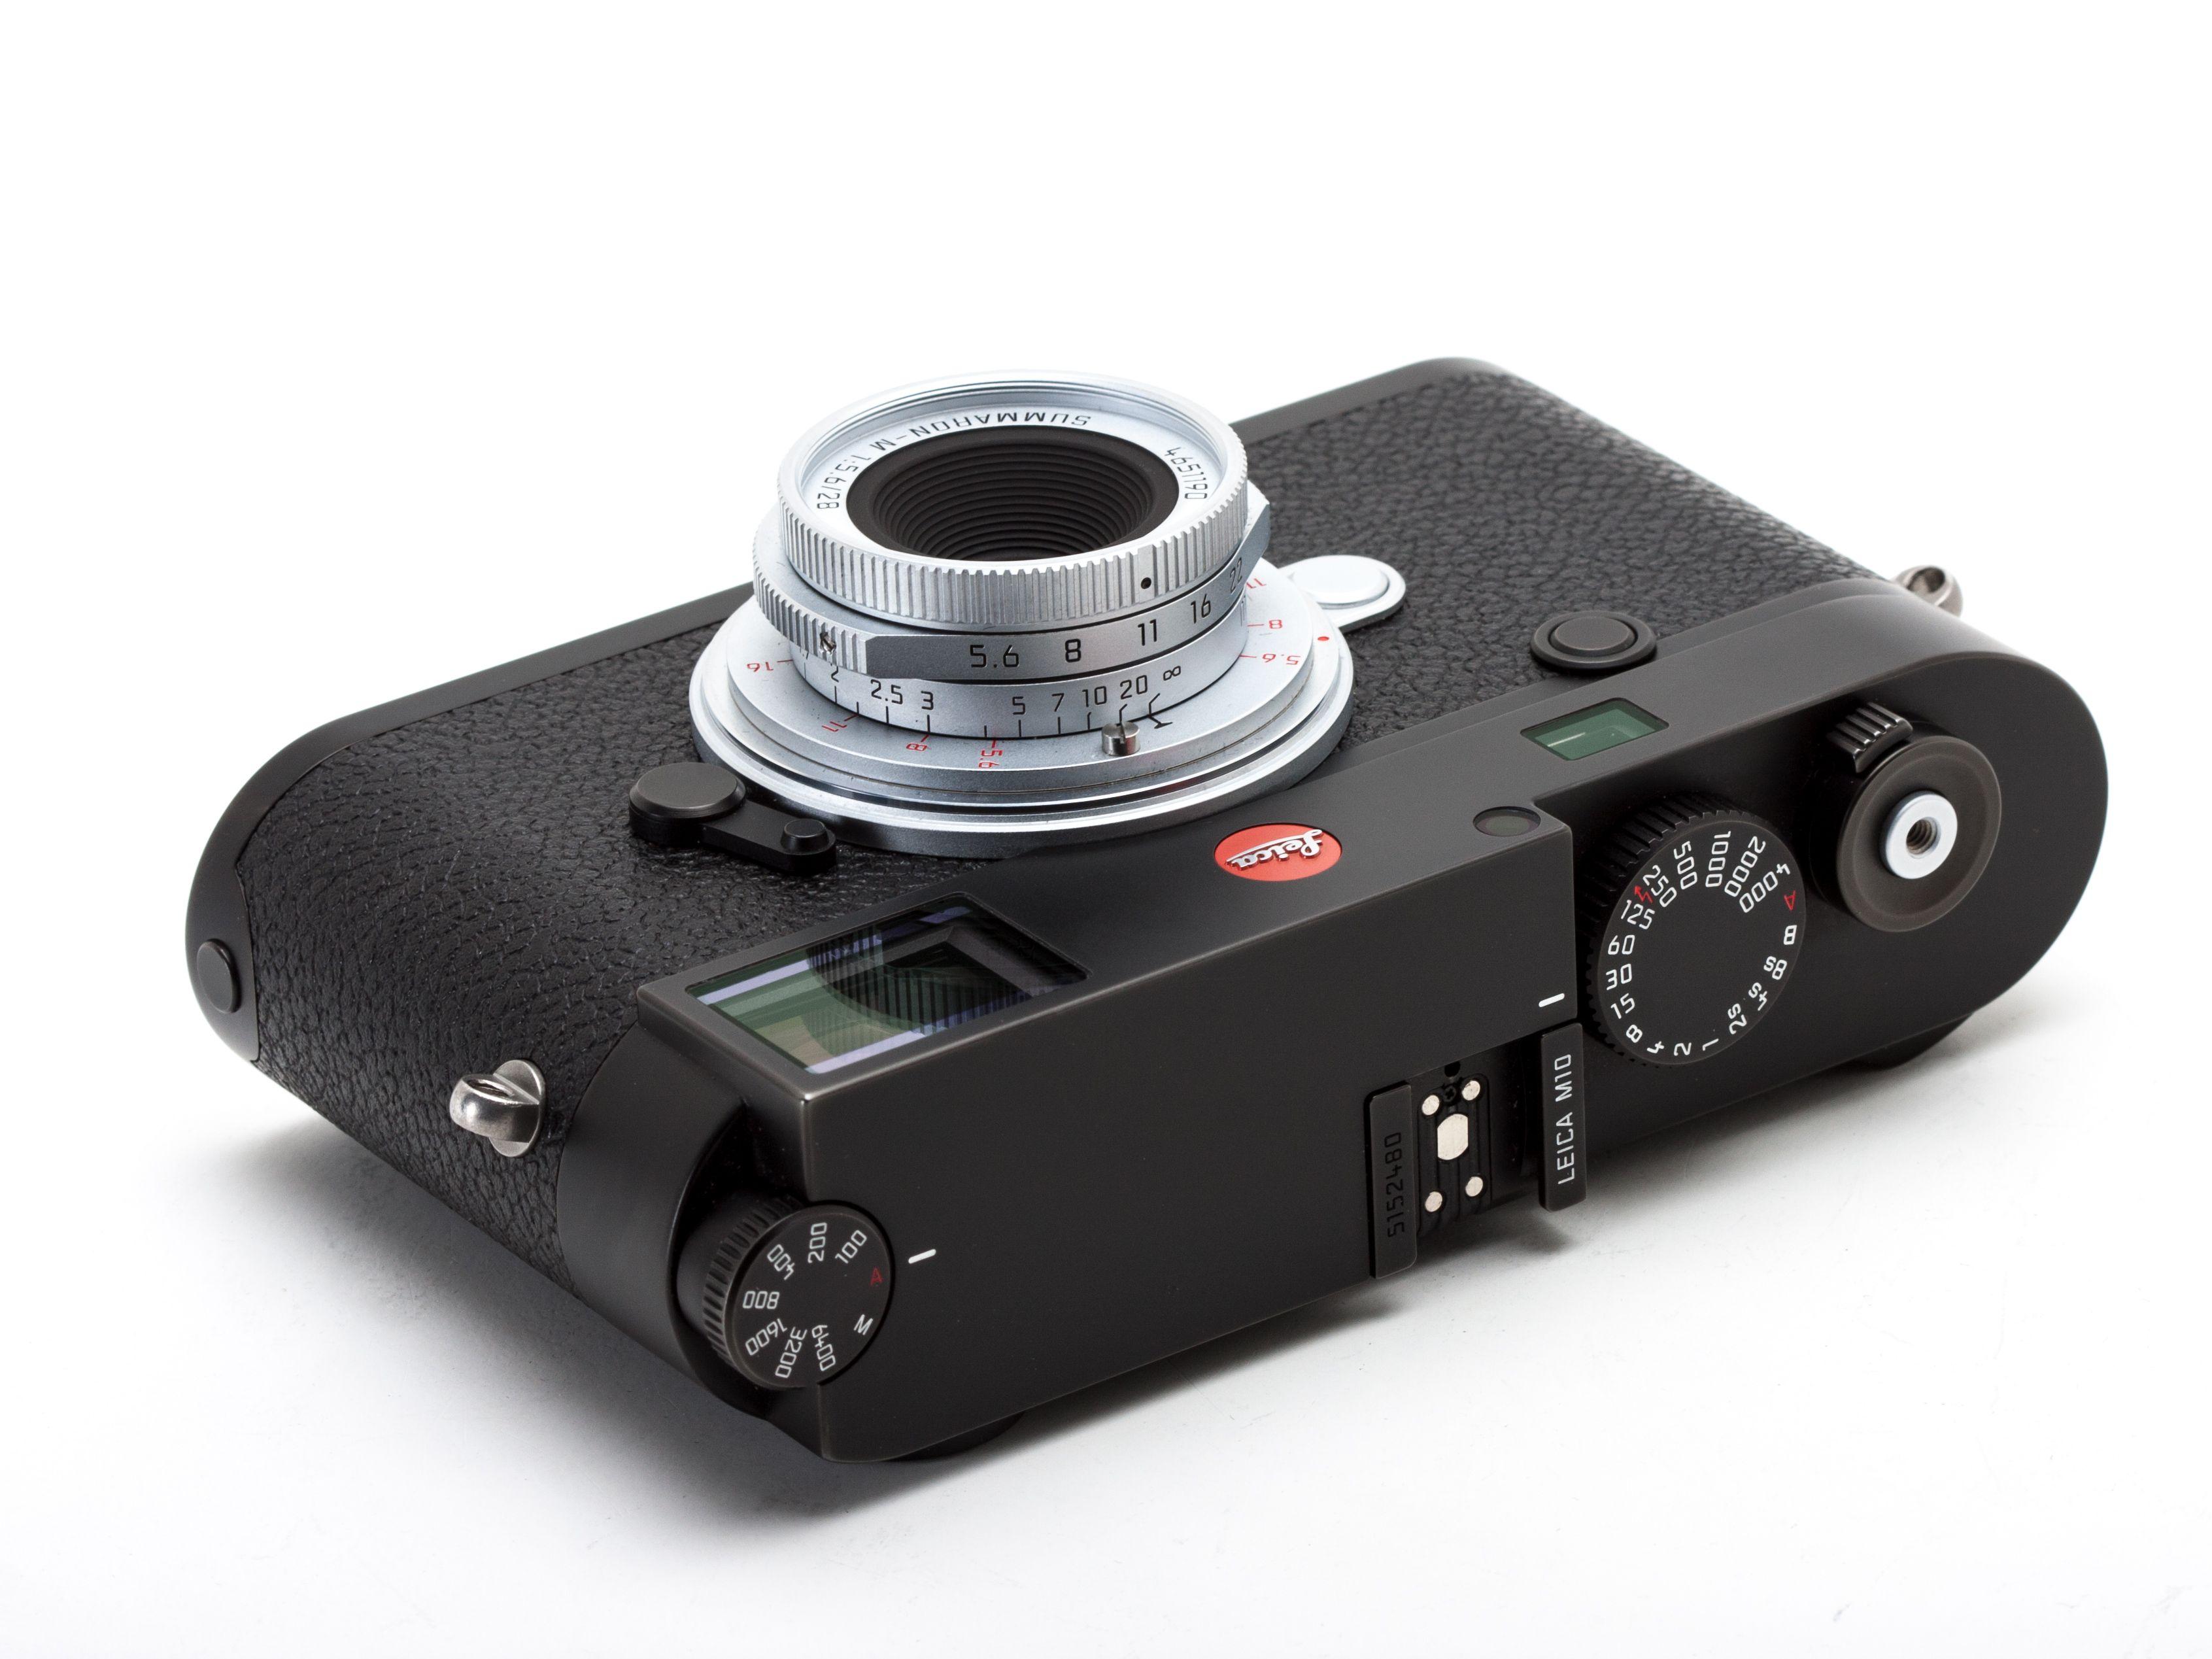 Summaron 28 F5 6 Ltm Vs Canon 28 F2 8 Ltm Google Search Leica Leica M Leica Camera